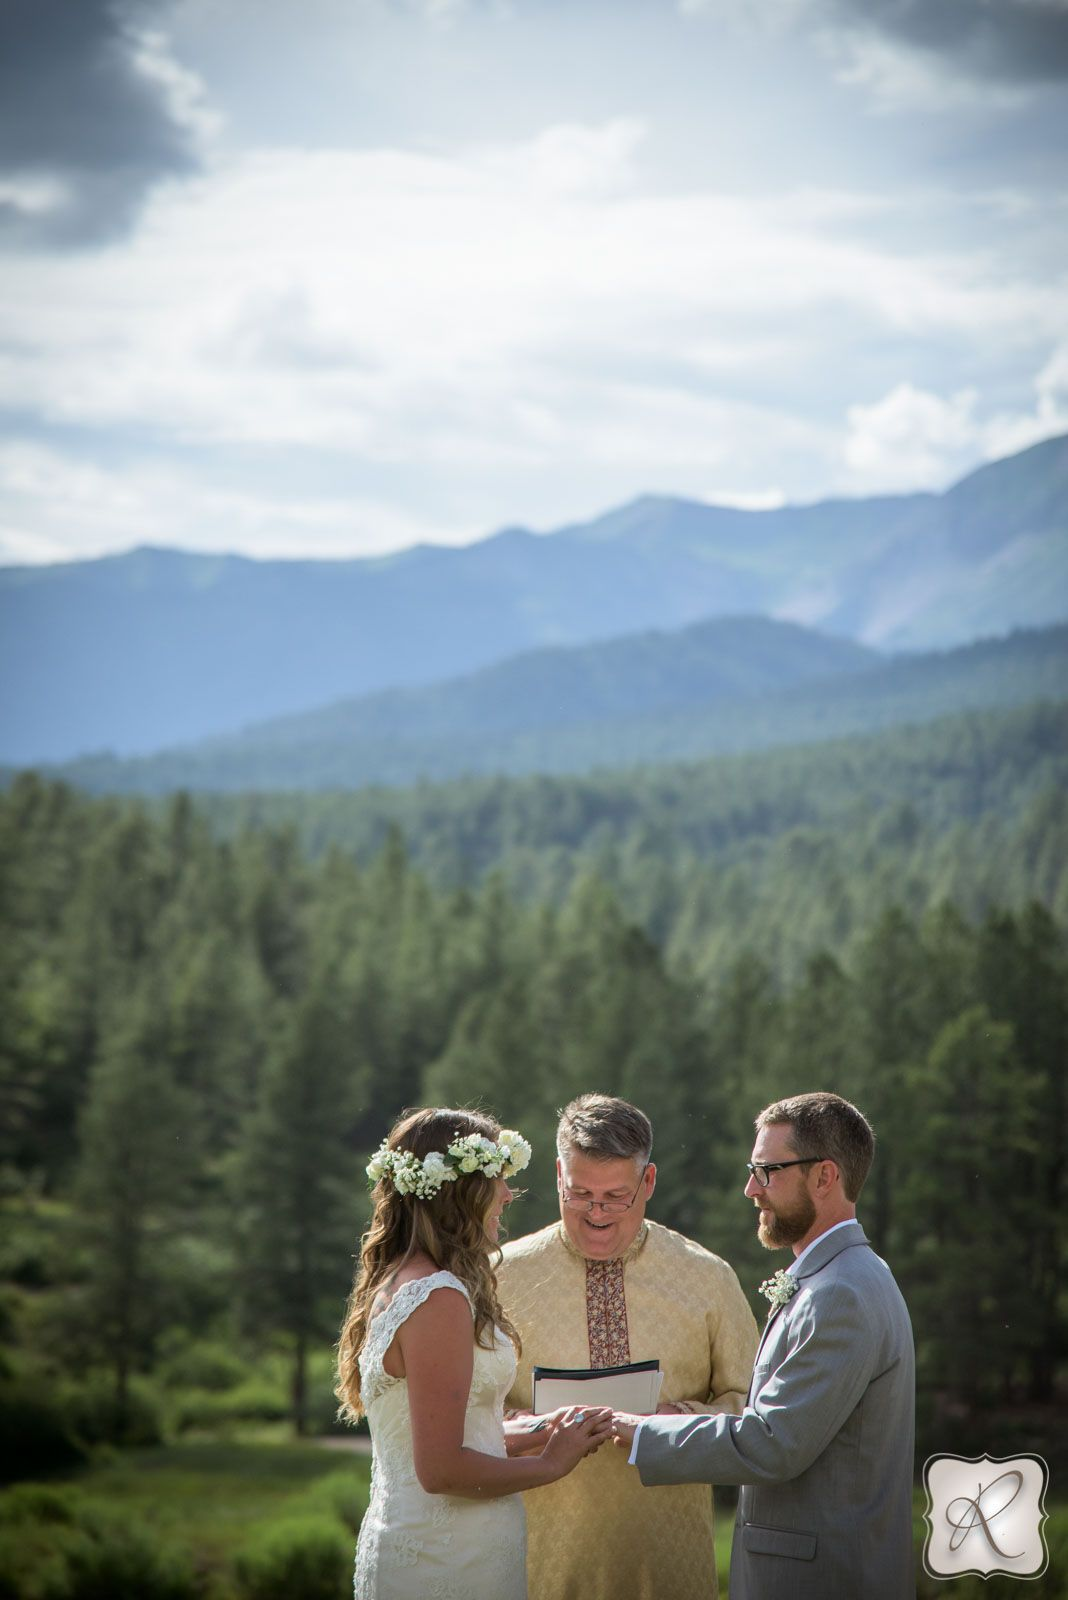 Brockett Wedding at Silver Mountain Guest Ranch Unique